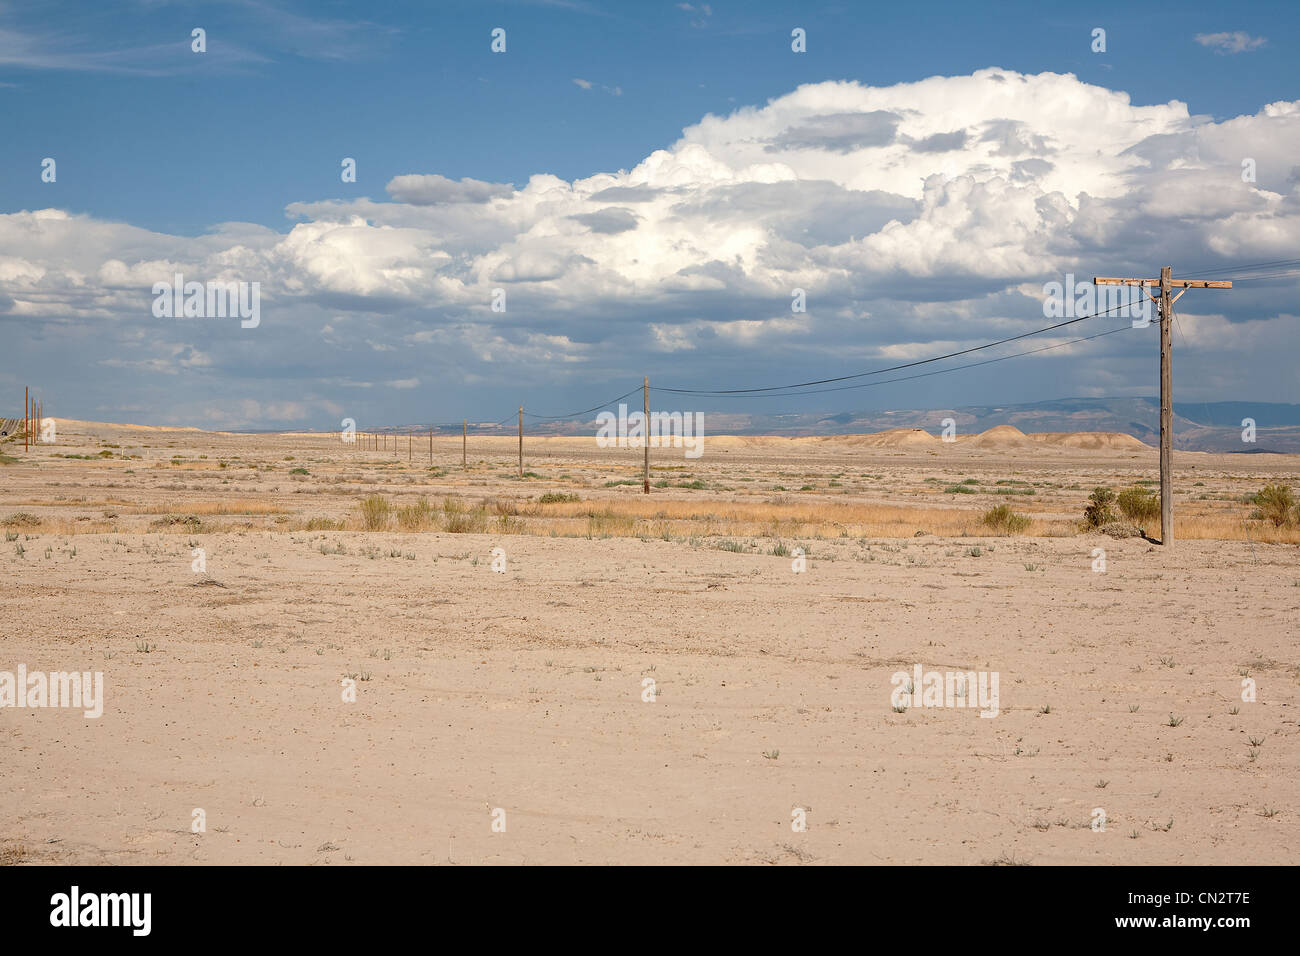 Electrical poles in isolated scene, Utah, USA - Stock Image